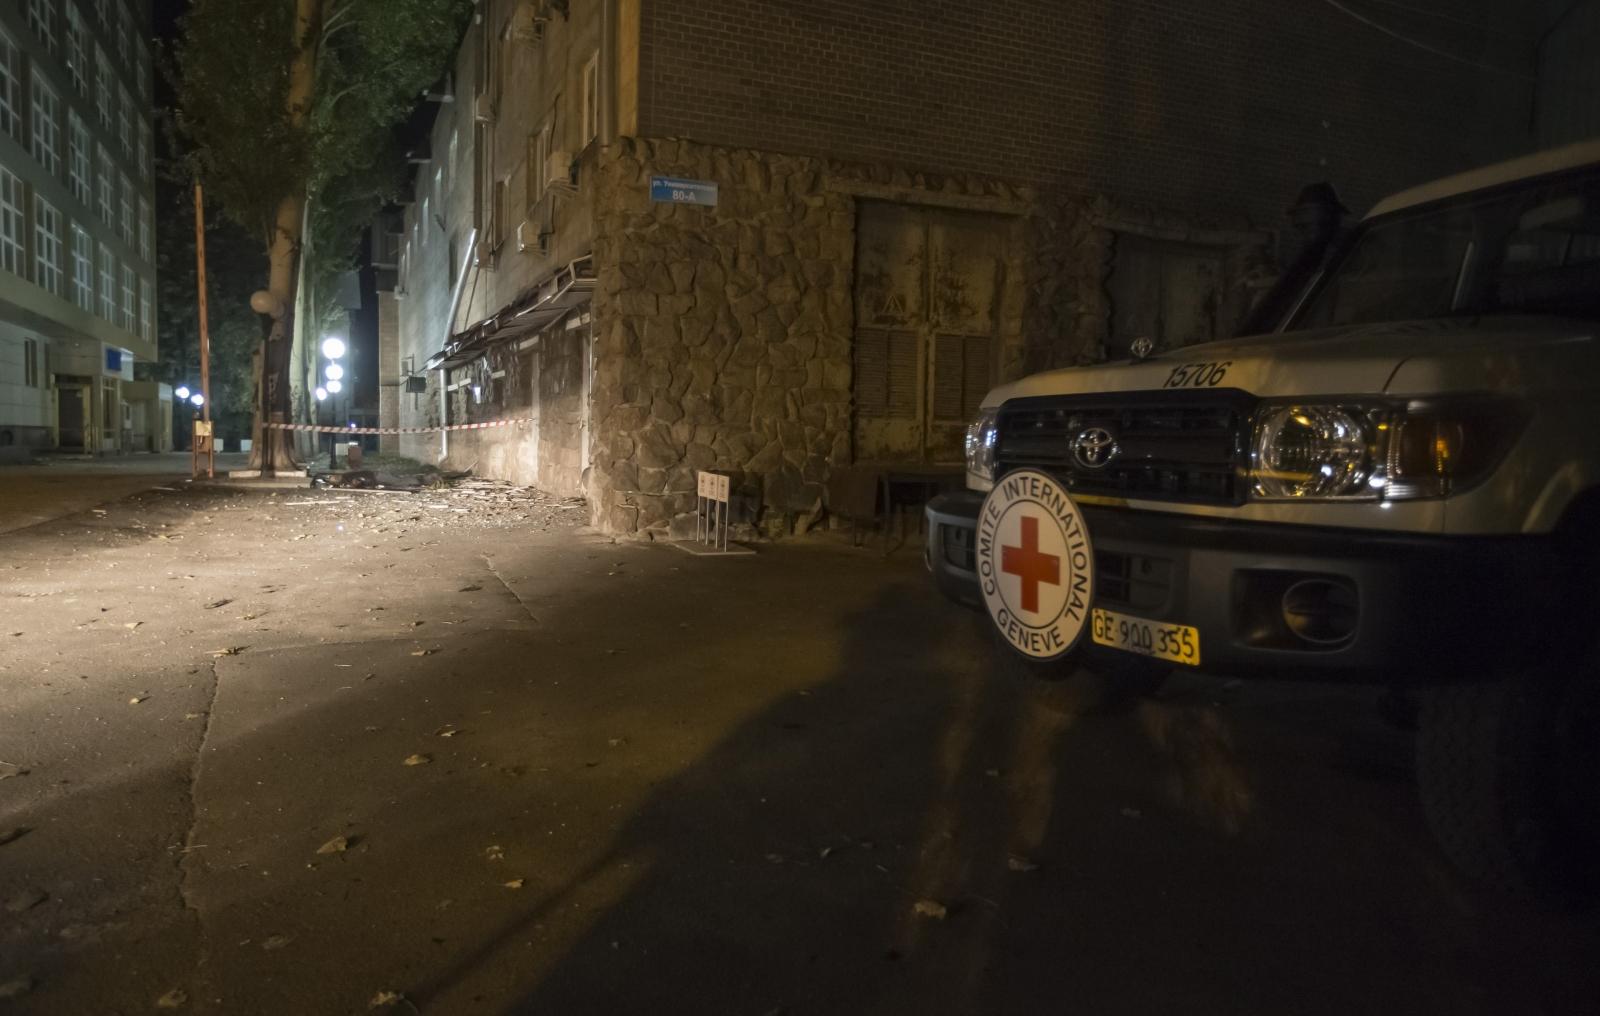 Ukraine: Red Cross Humanitarian Aid Worker Killed in Donetsk Mortar Attack